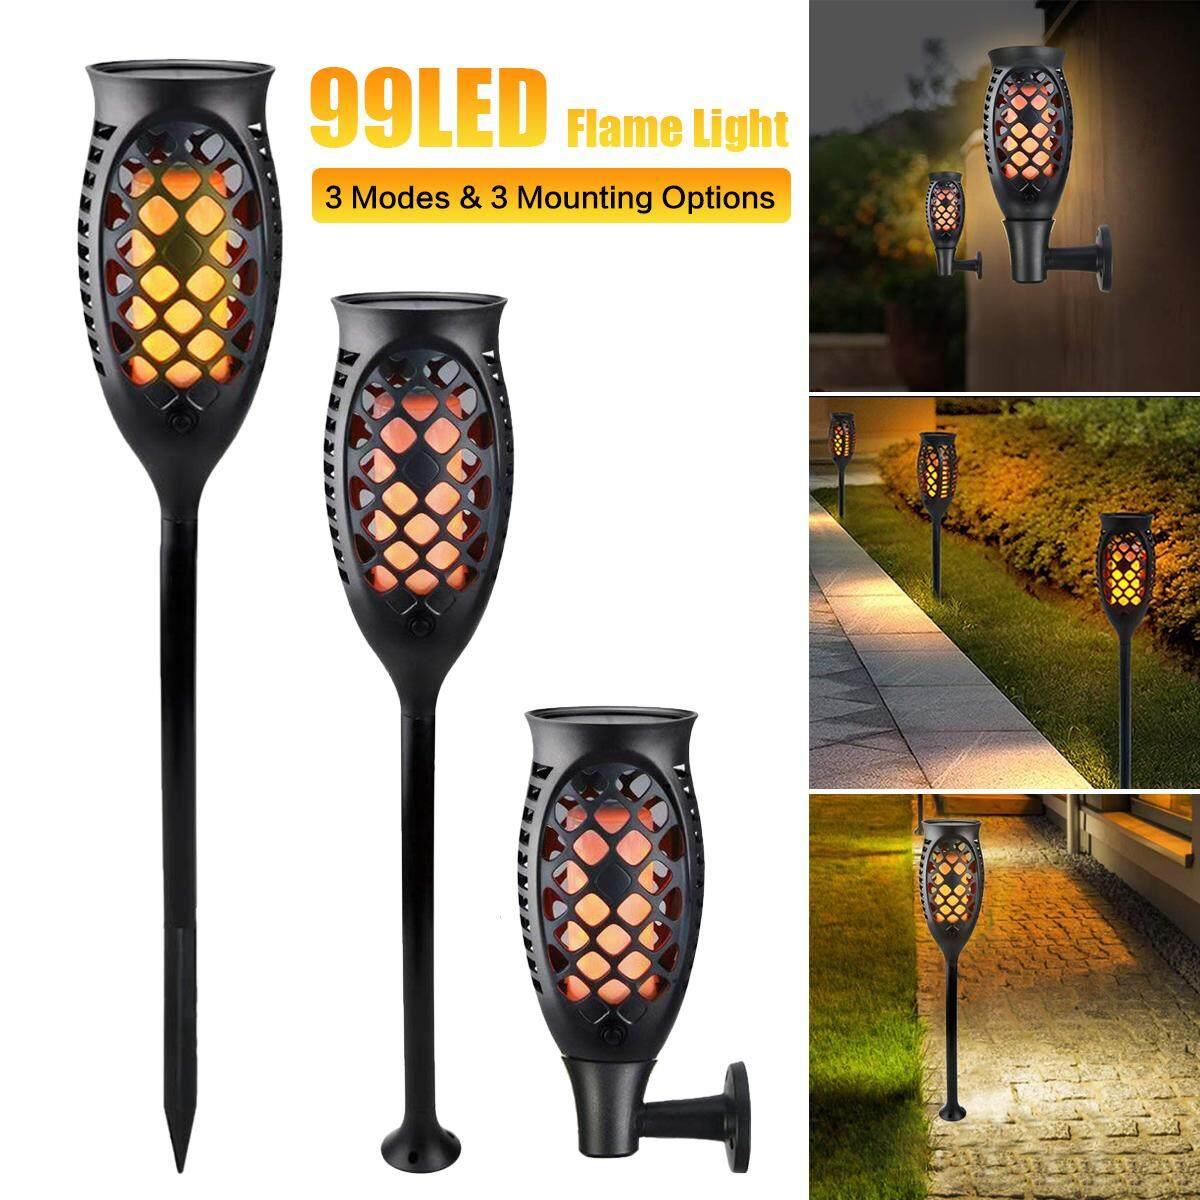 99 LED Waterproof IP65 Solar Tiki Torch Light Dancing Flickering Garden Lamp Torch Light Flame Lamp Outdoor Led Lamp Garden Path